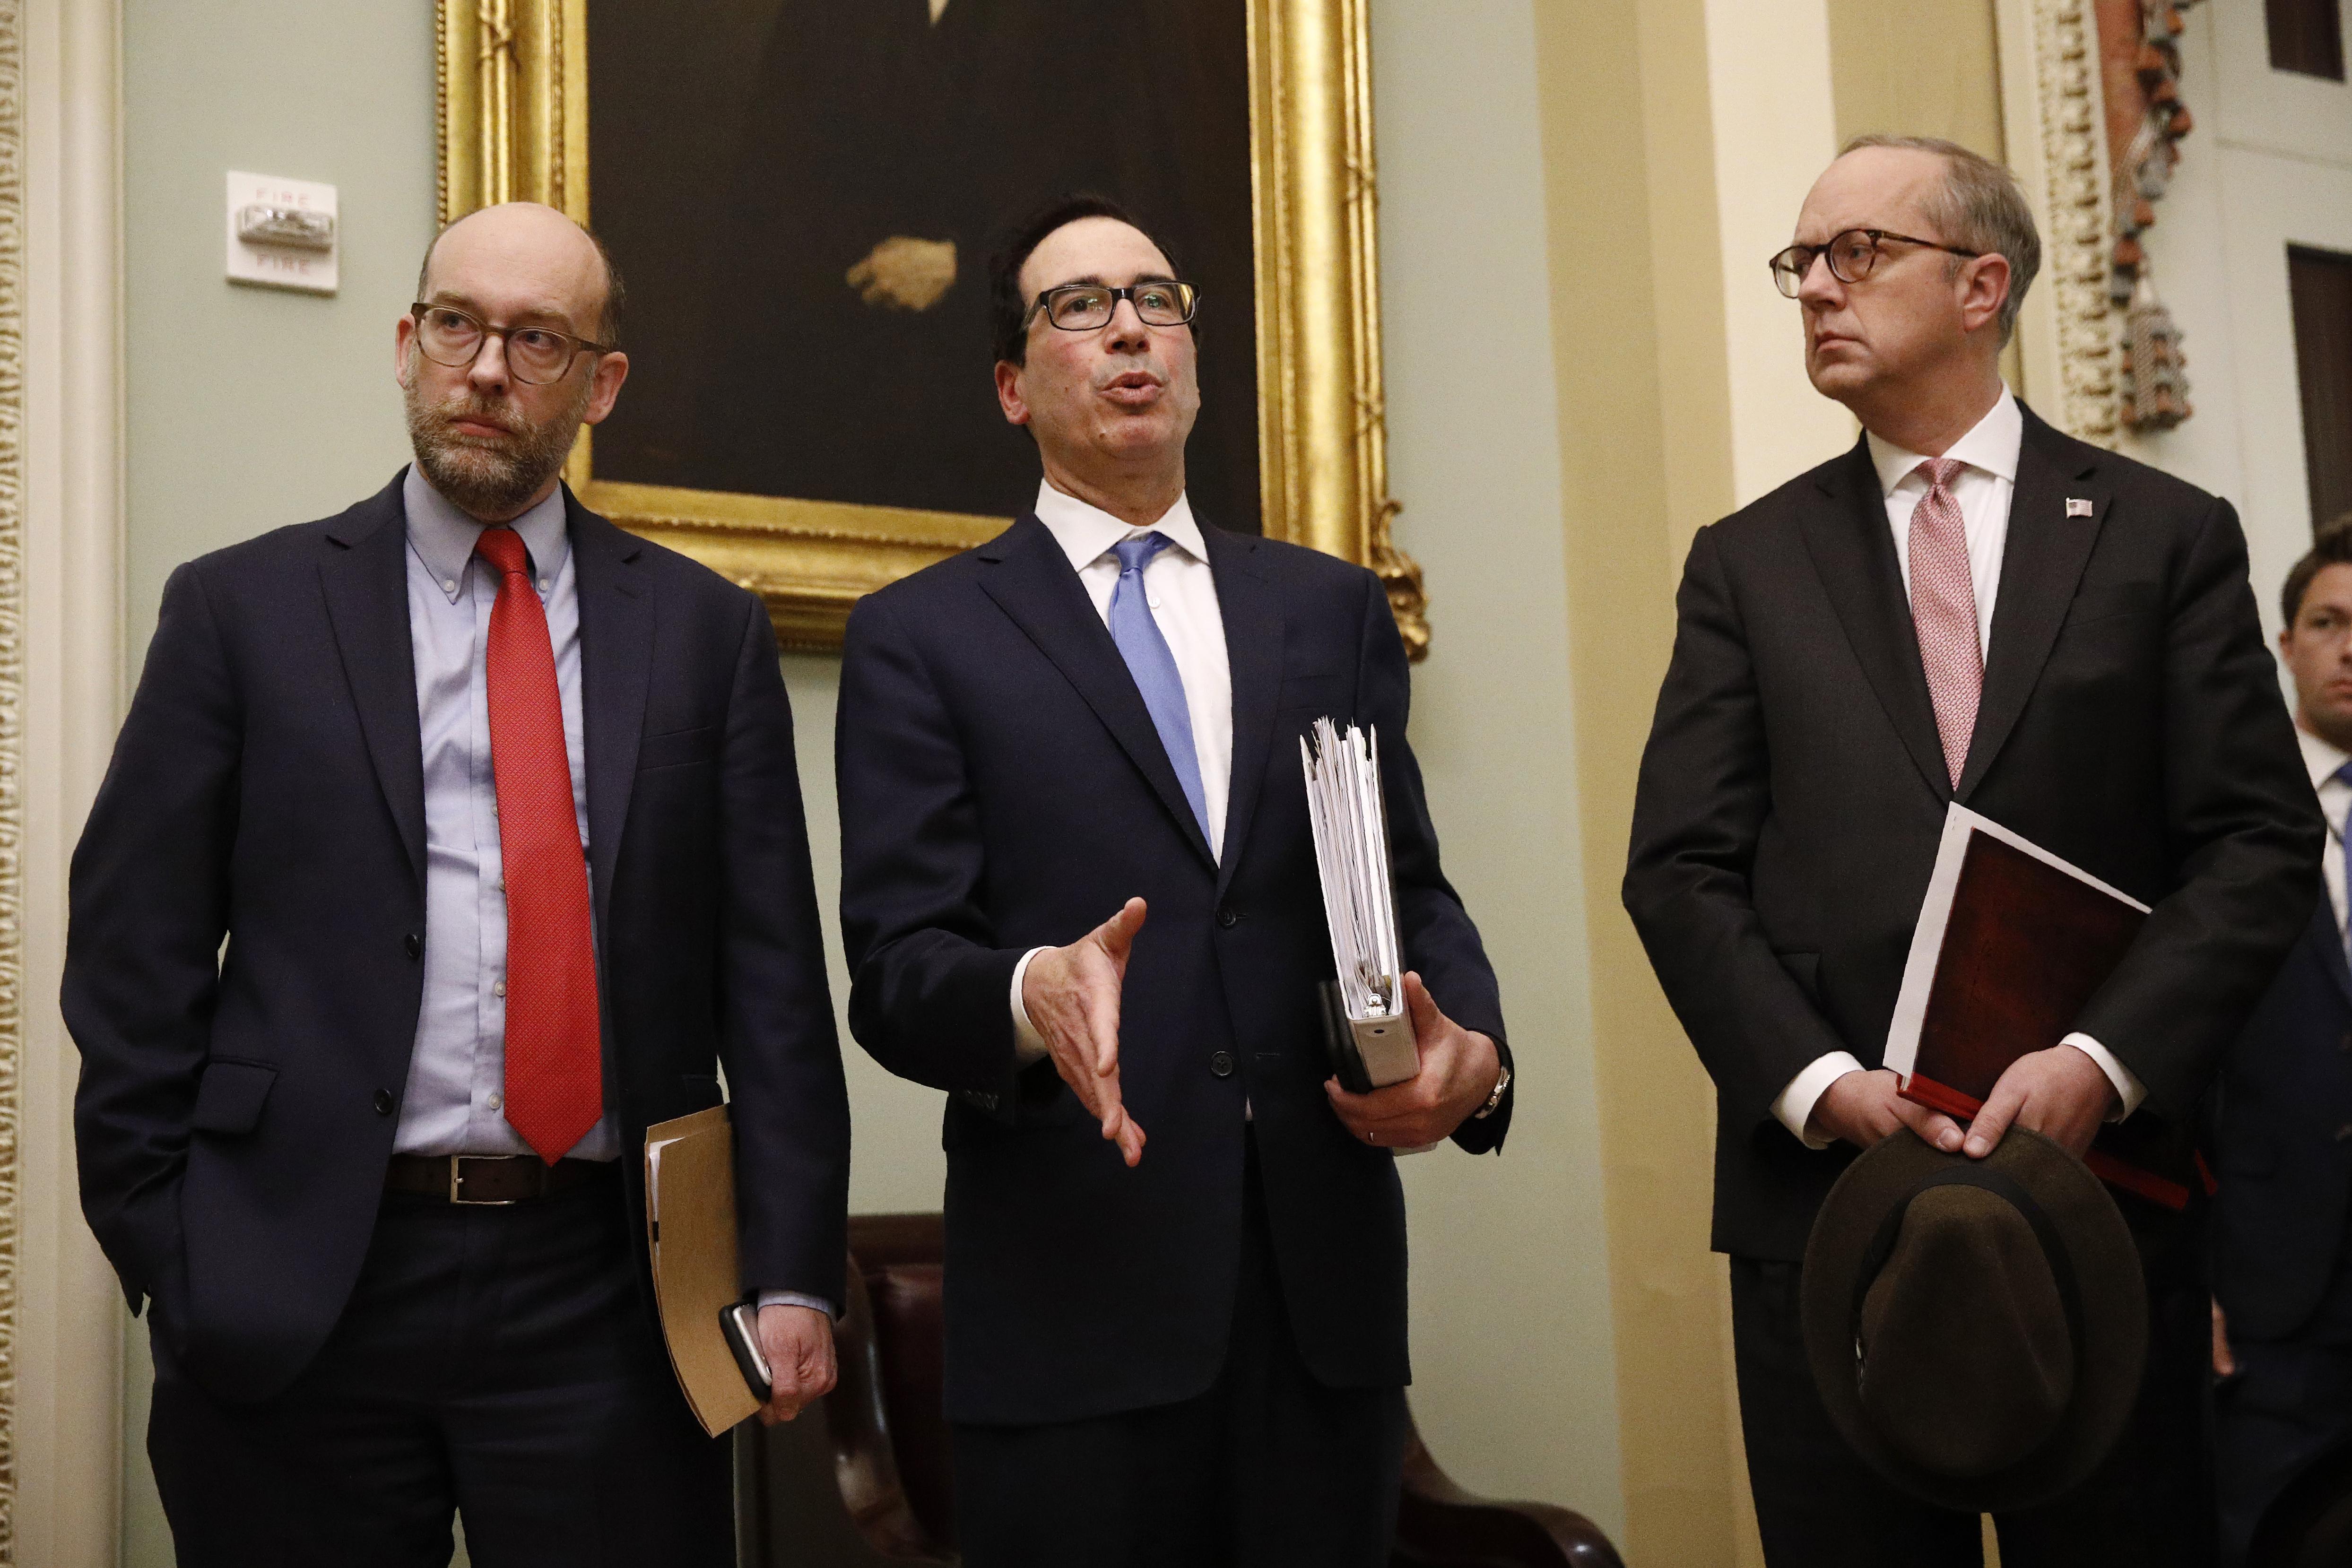 Treasury Secretary Steve Mnuchin (centre) speaks with the media on Capitol Hill in Washington.